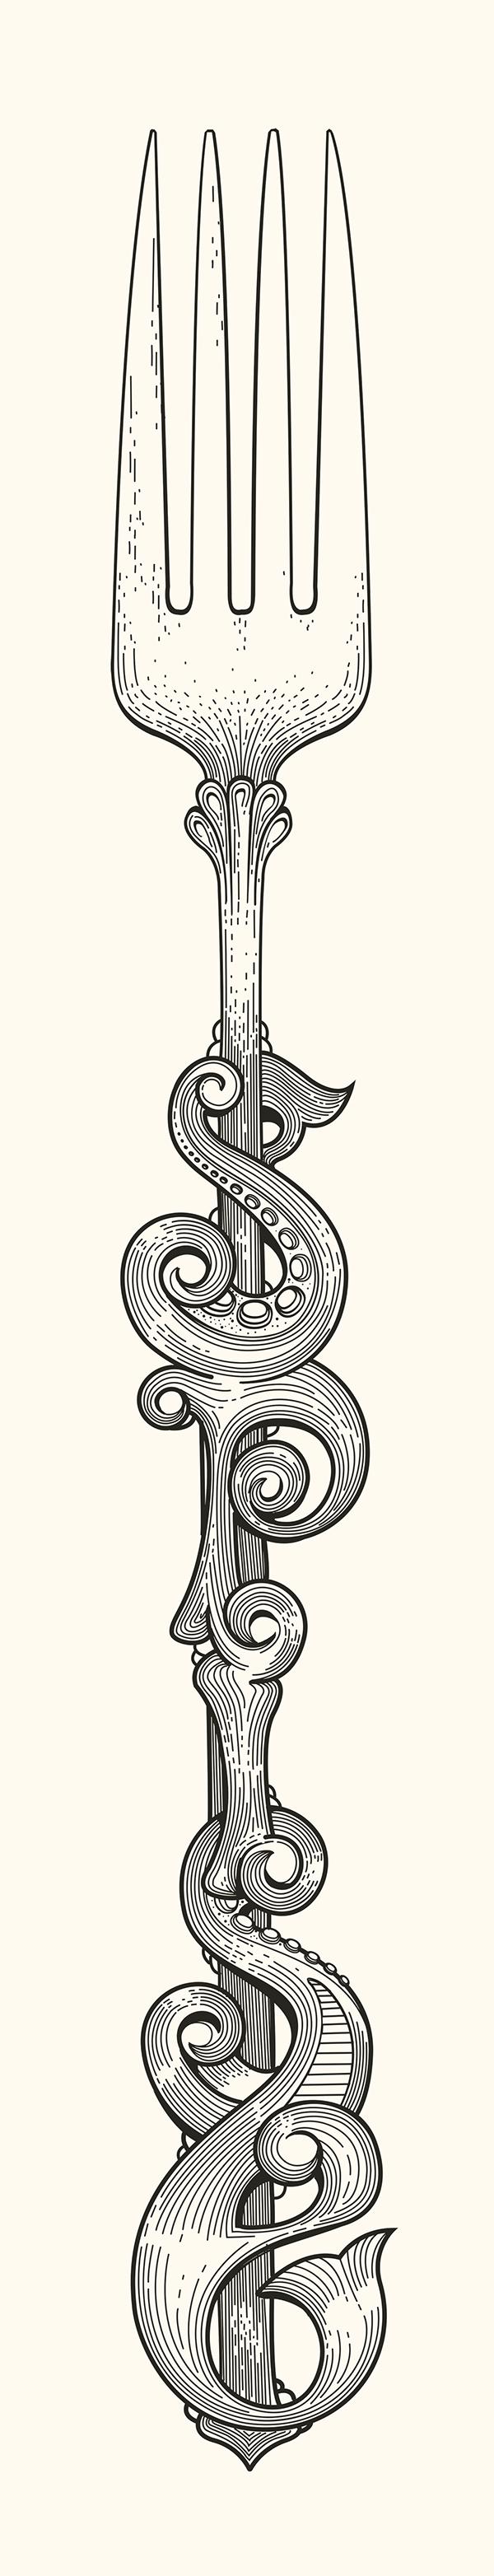 Spise Typography Project